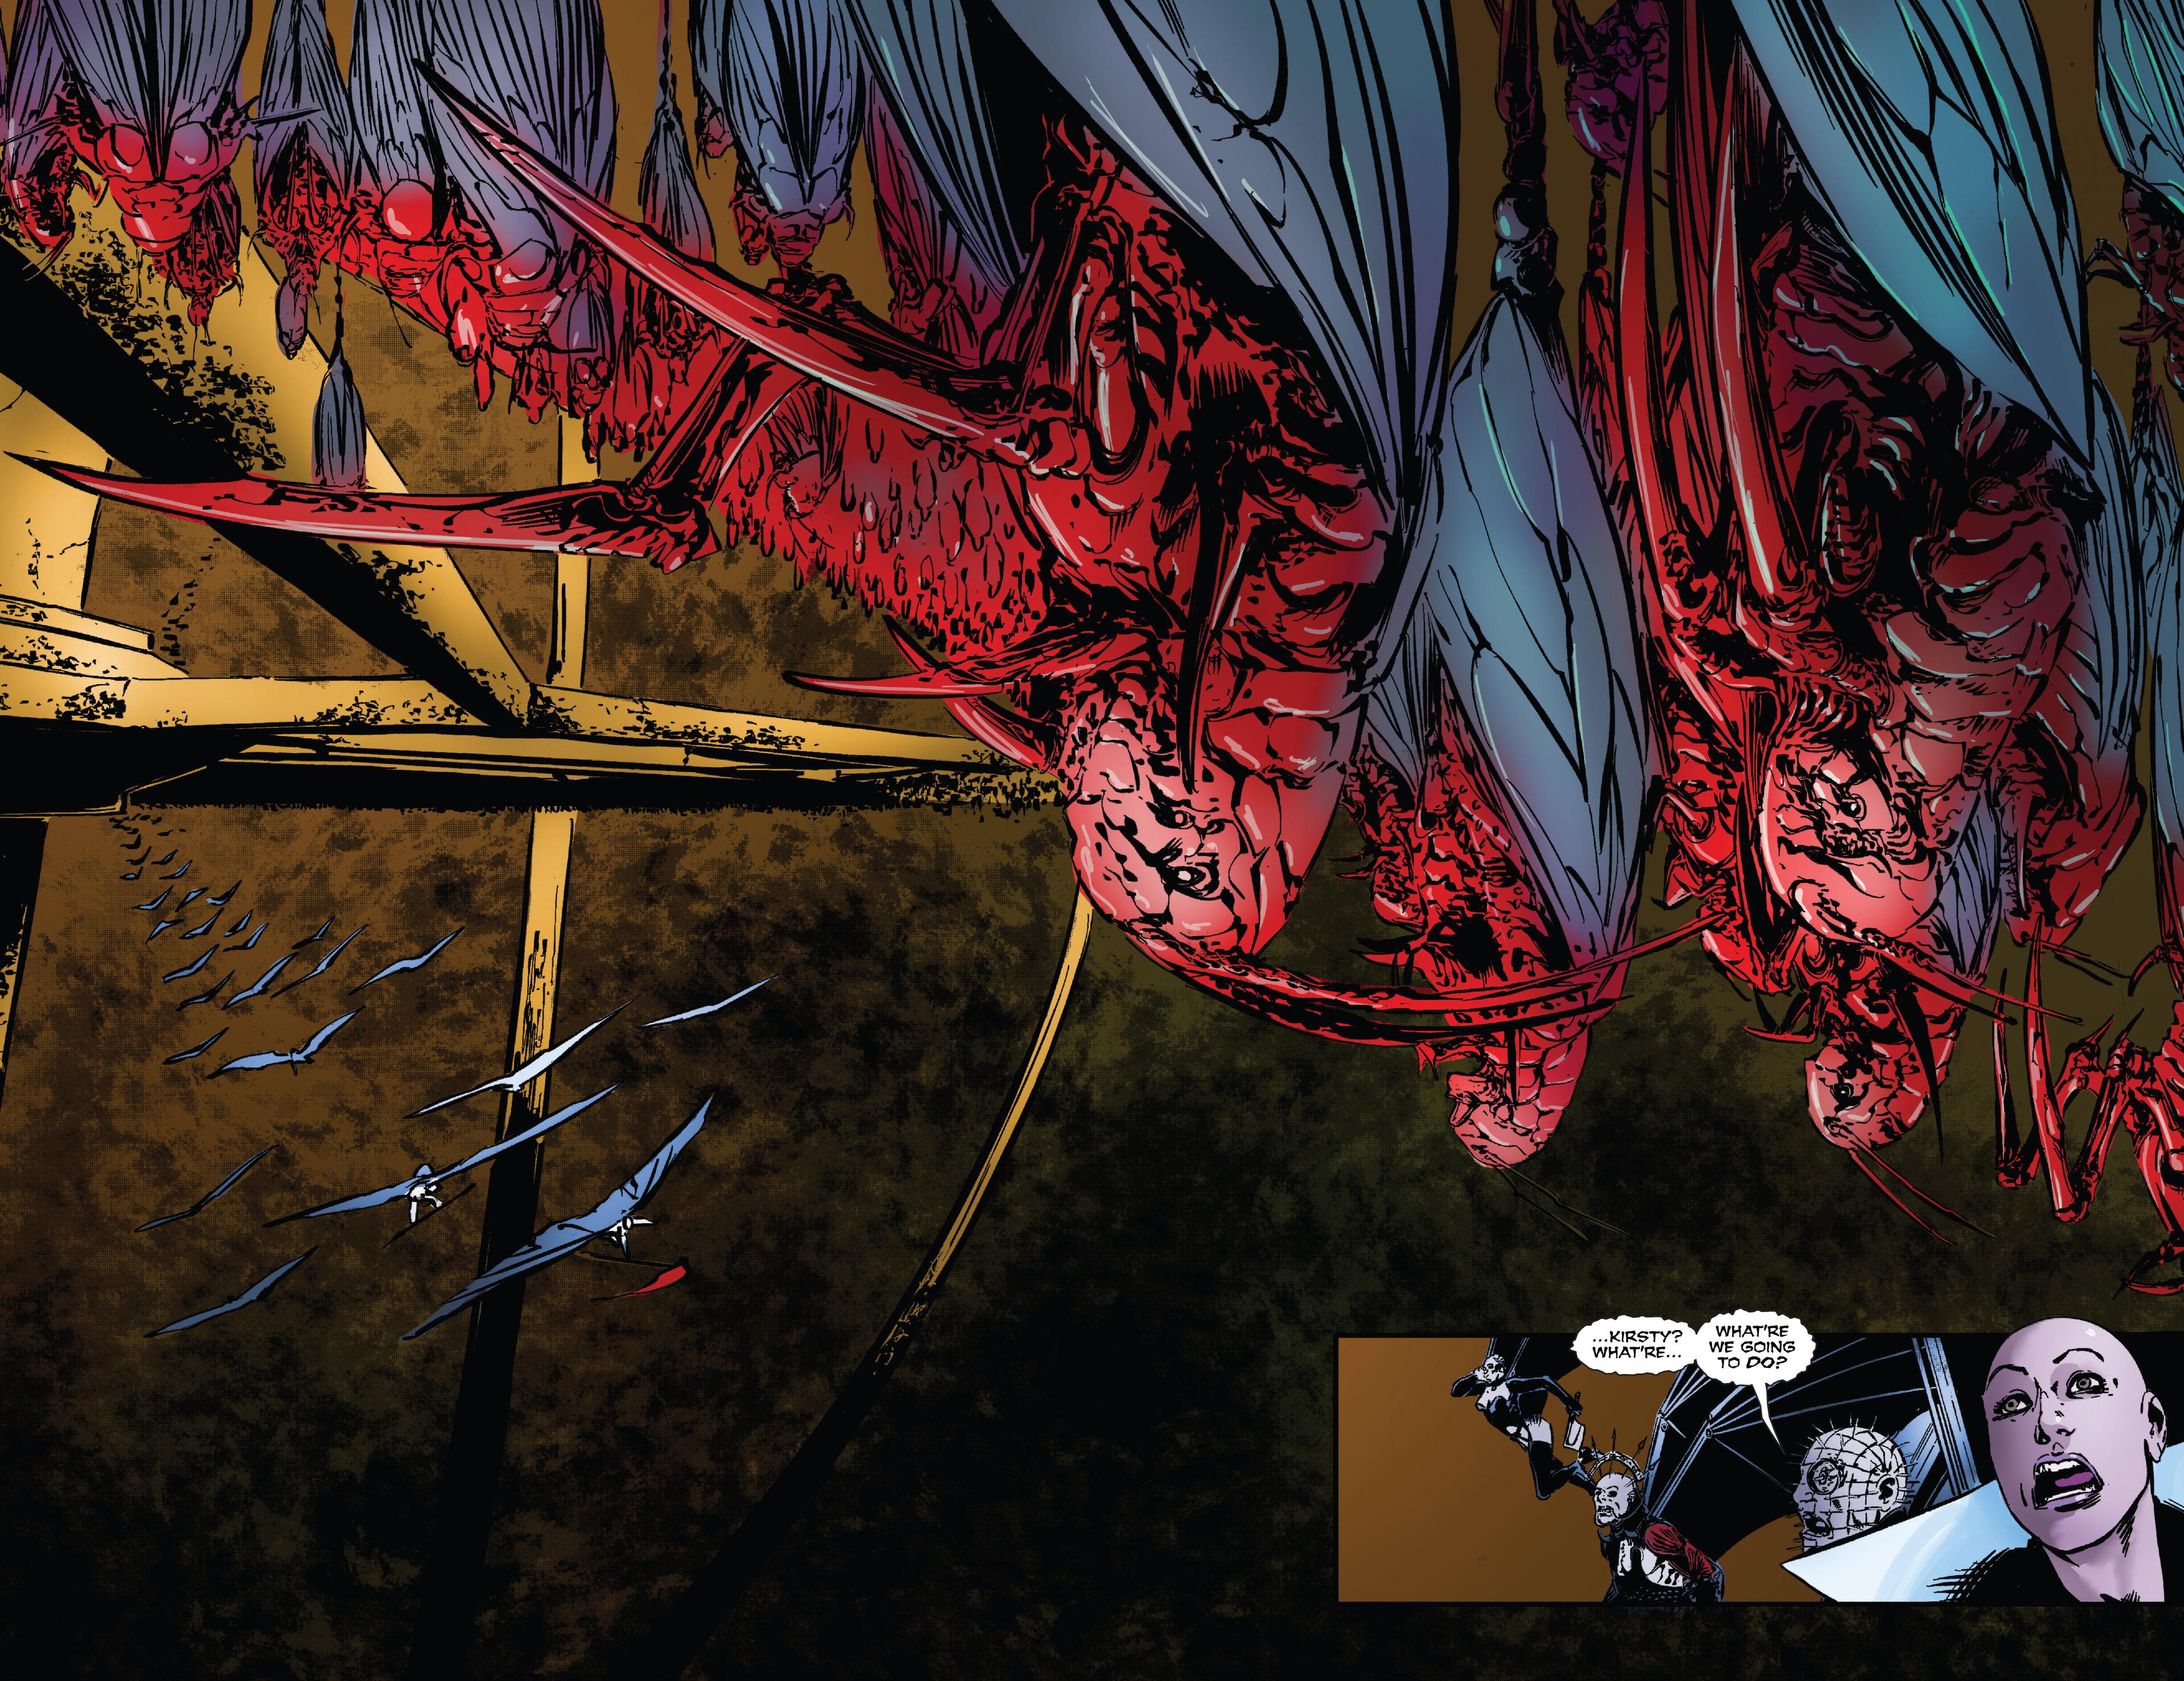 Read online Clive Barker's Hellraiser: The Dark Watch comic -  Issue # TPB 3 - 72